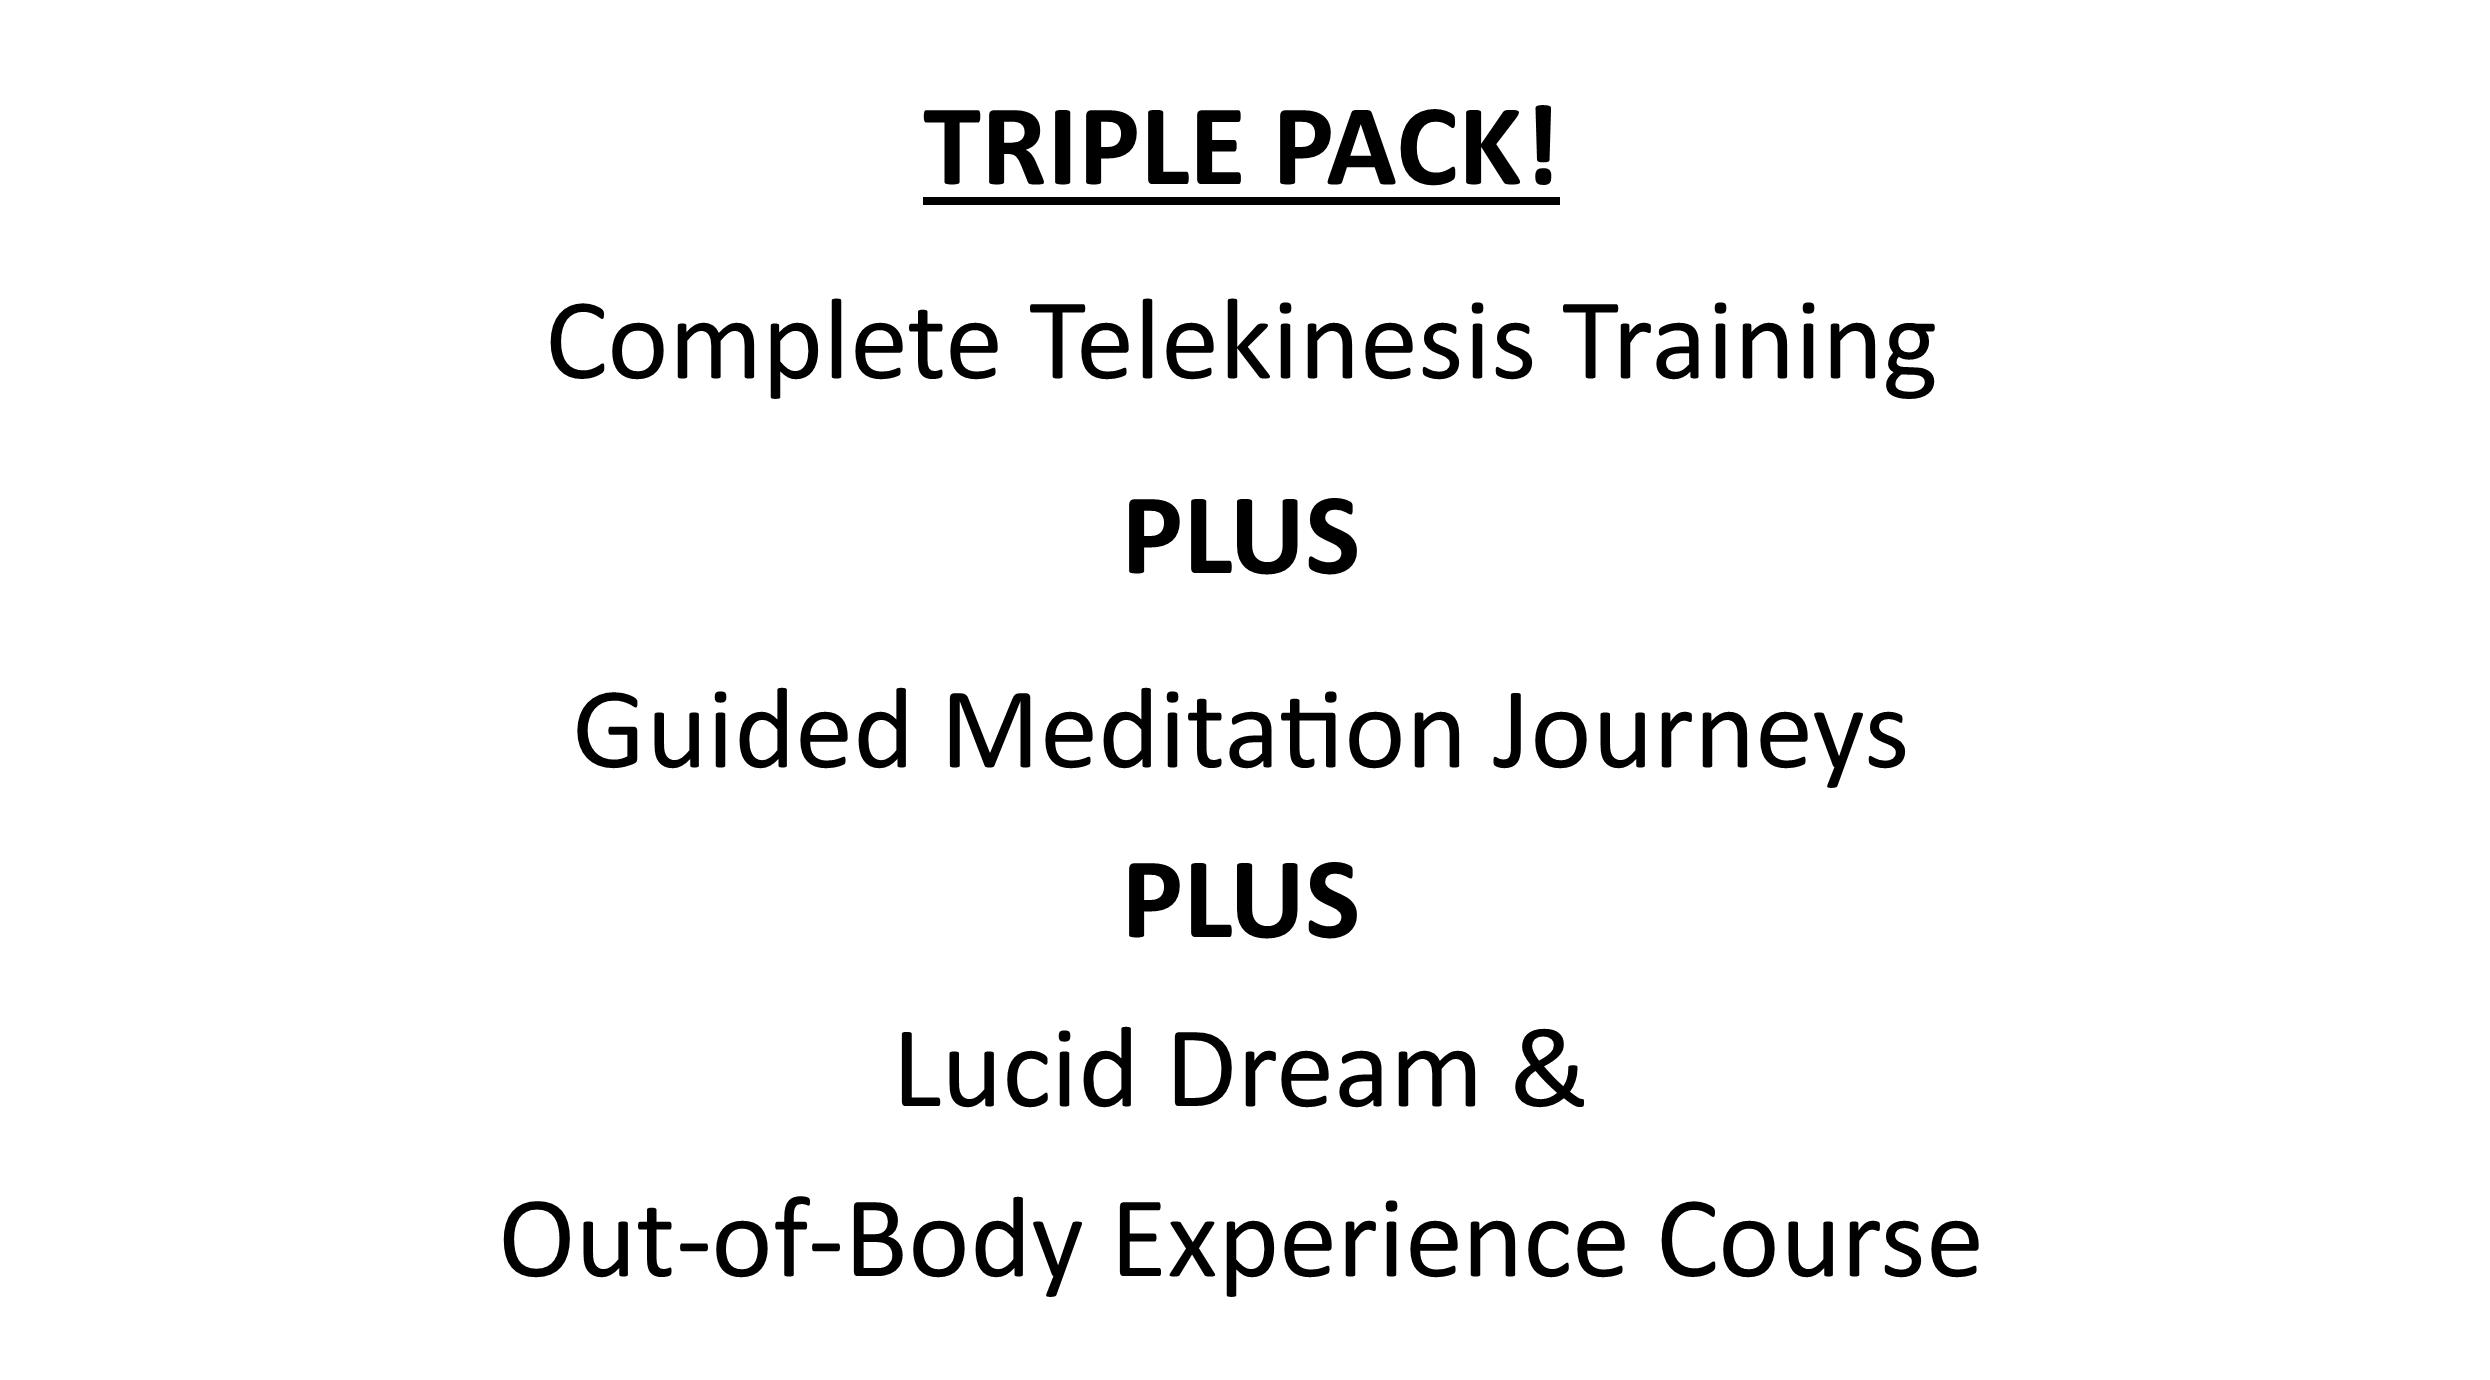 TRIPLE Bundle - Meditation, Telekinesis, Lucid Dreaming & OBE